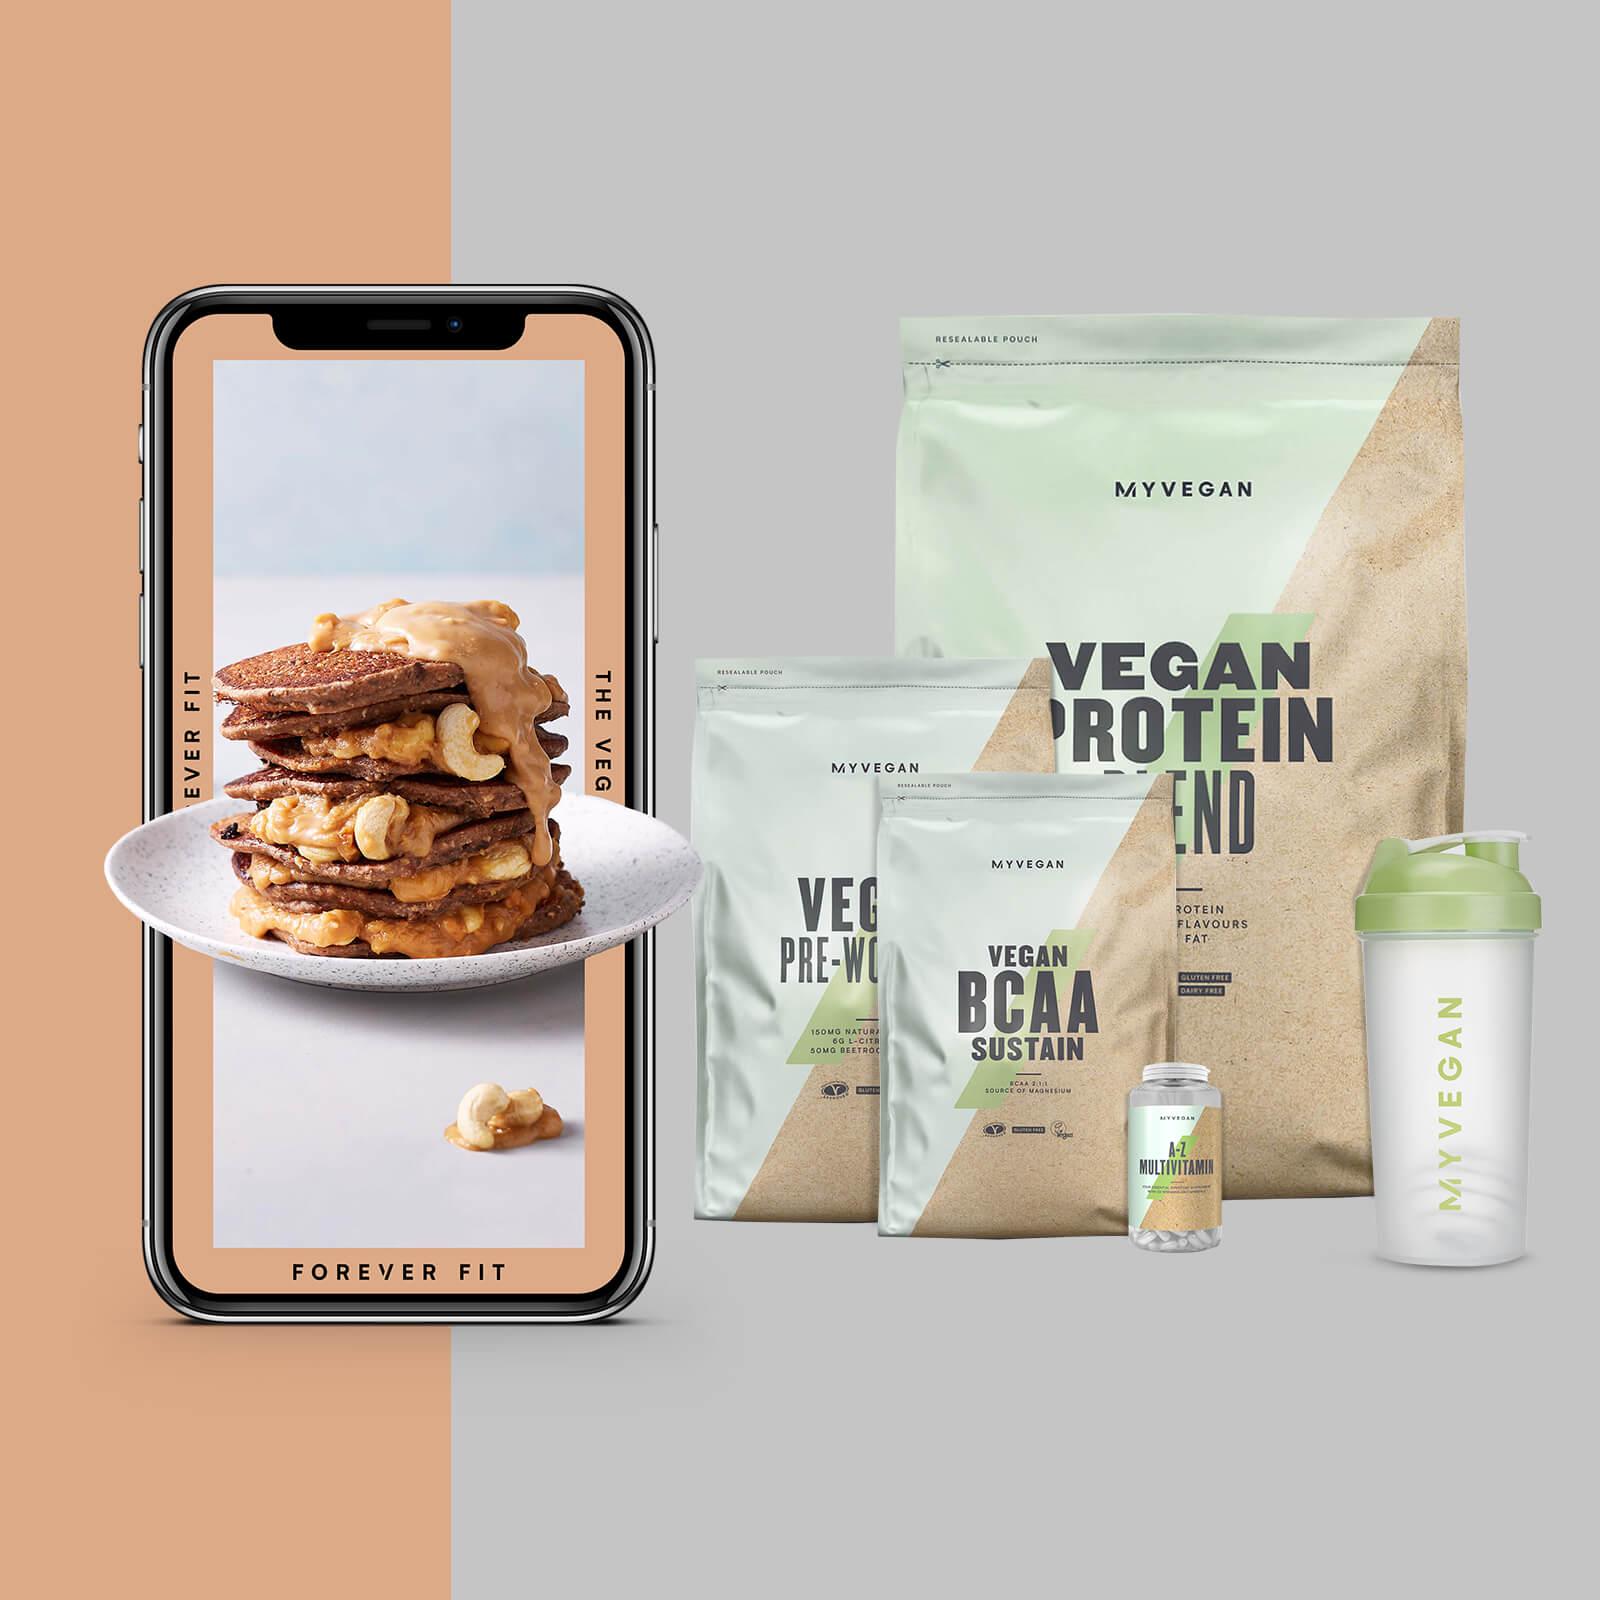 Le Pack Vegan + Guide Entraînement et Nutrition Offert - Orange - Sour Apple - Unflavoured